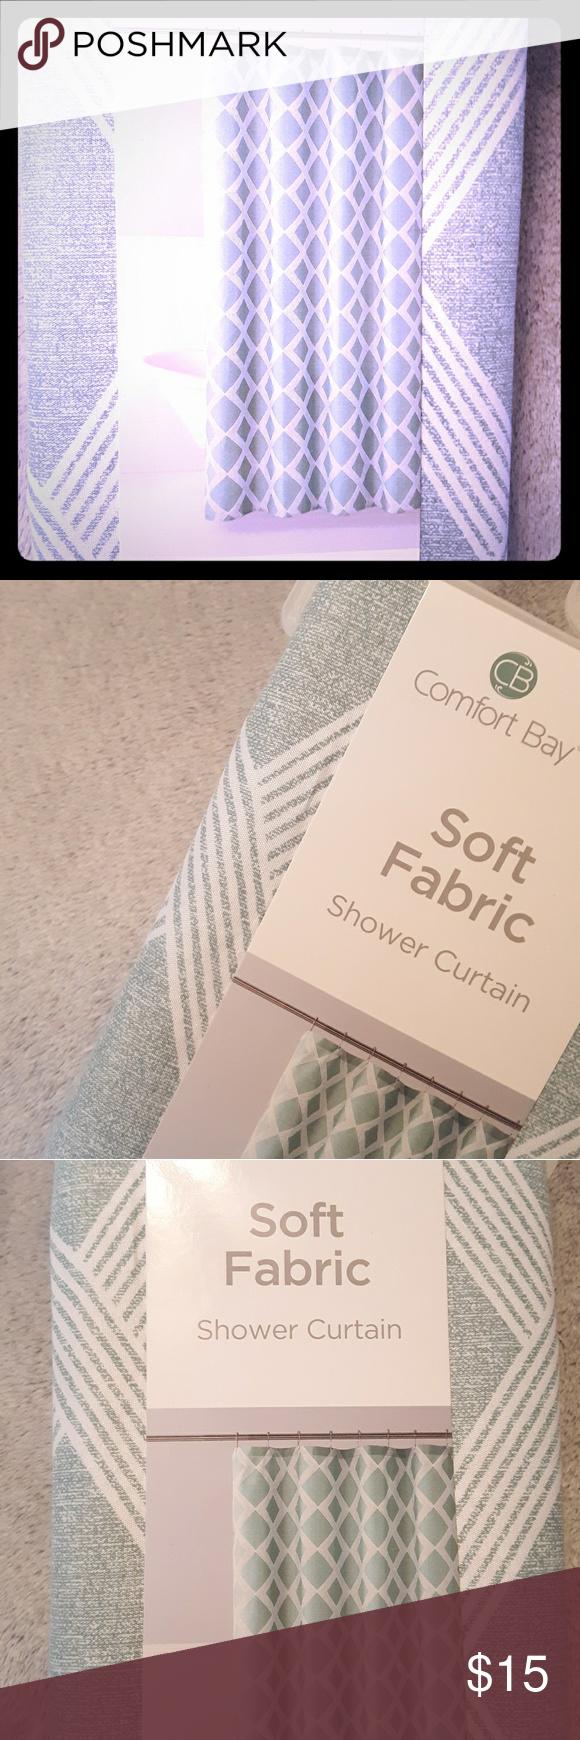 Comfort Bay Shower Curtain Soft Fabric Nib Diamond Comfort Bay